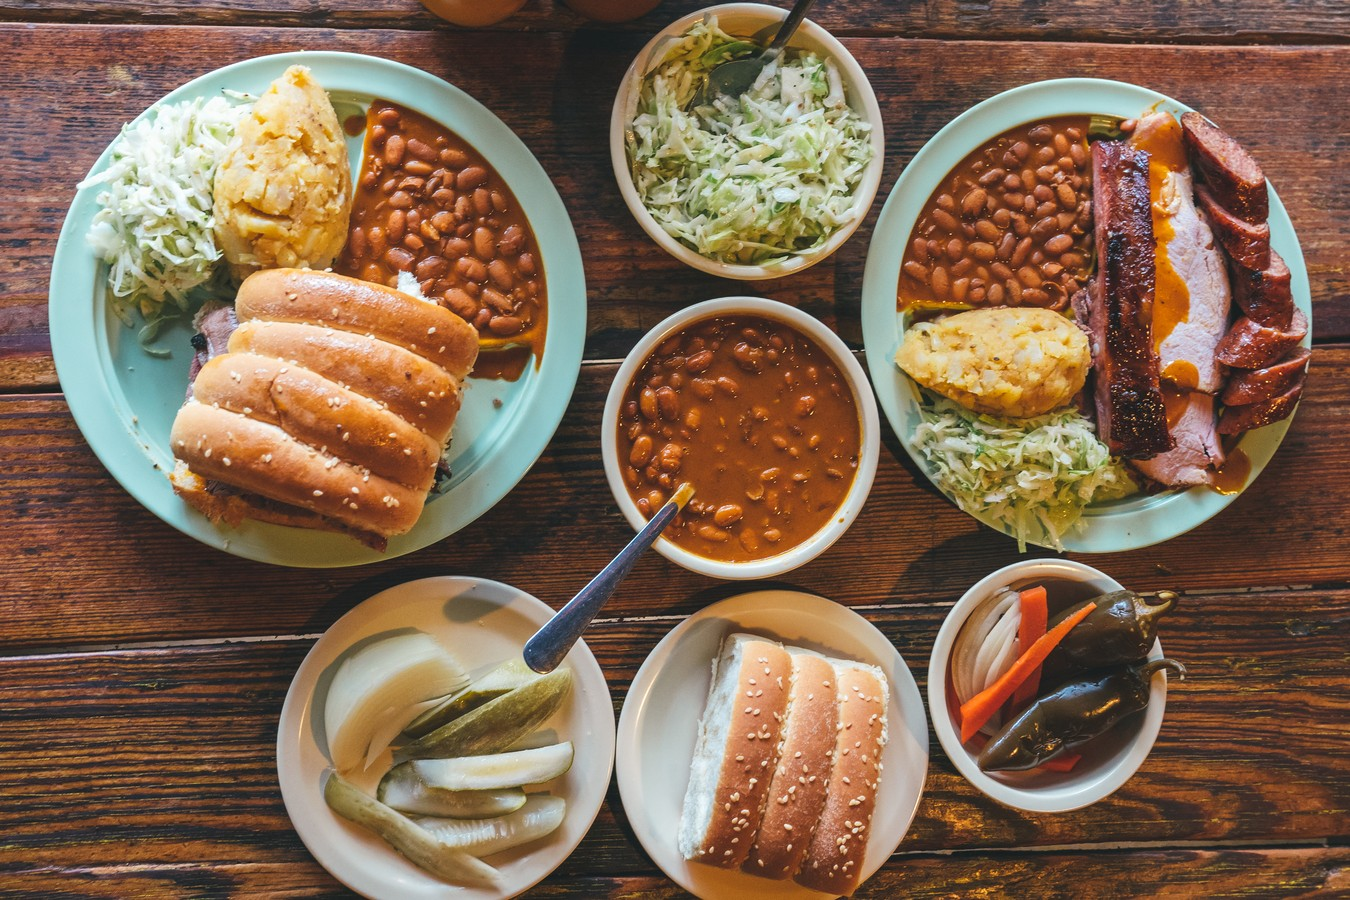 The Salt Lick, Parten Amenities, Parten TX, Parten, SW Austin, Parten Community, SW Austin BBQ